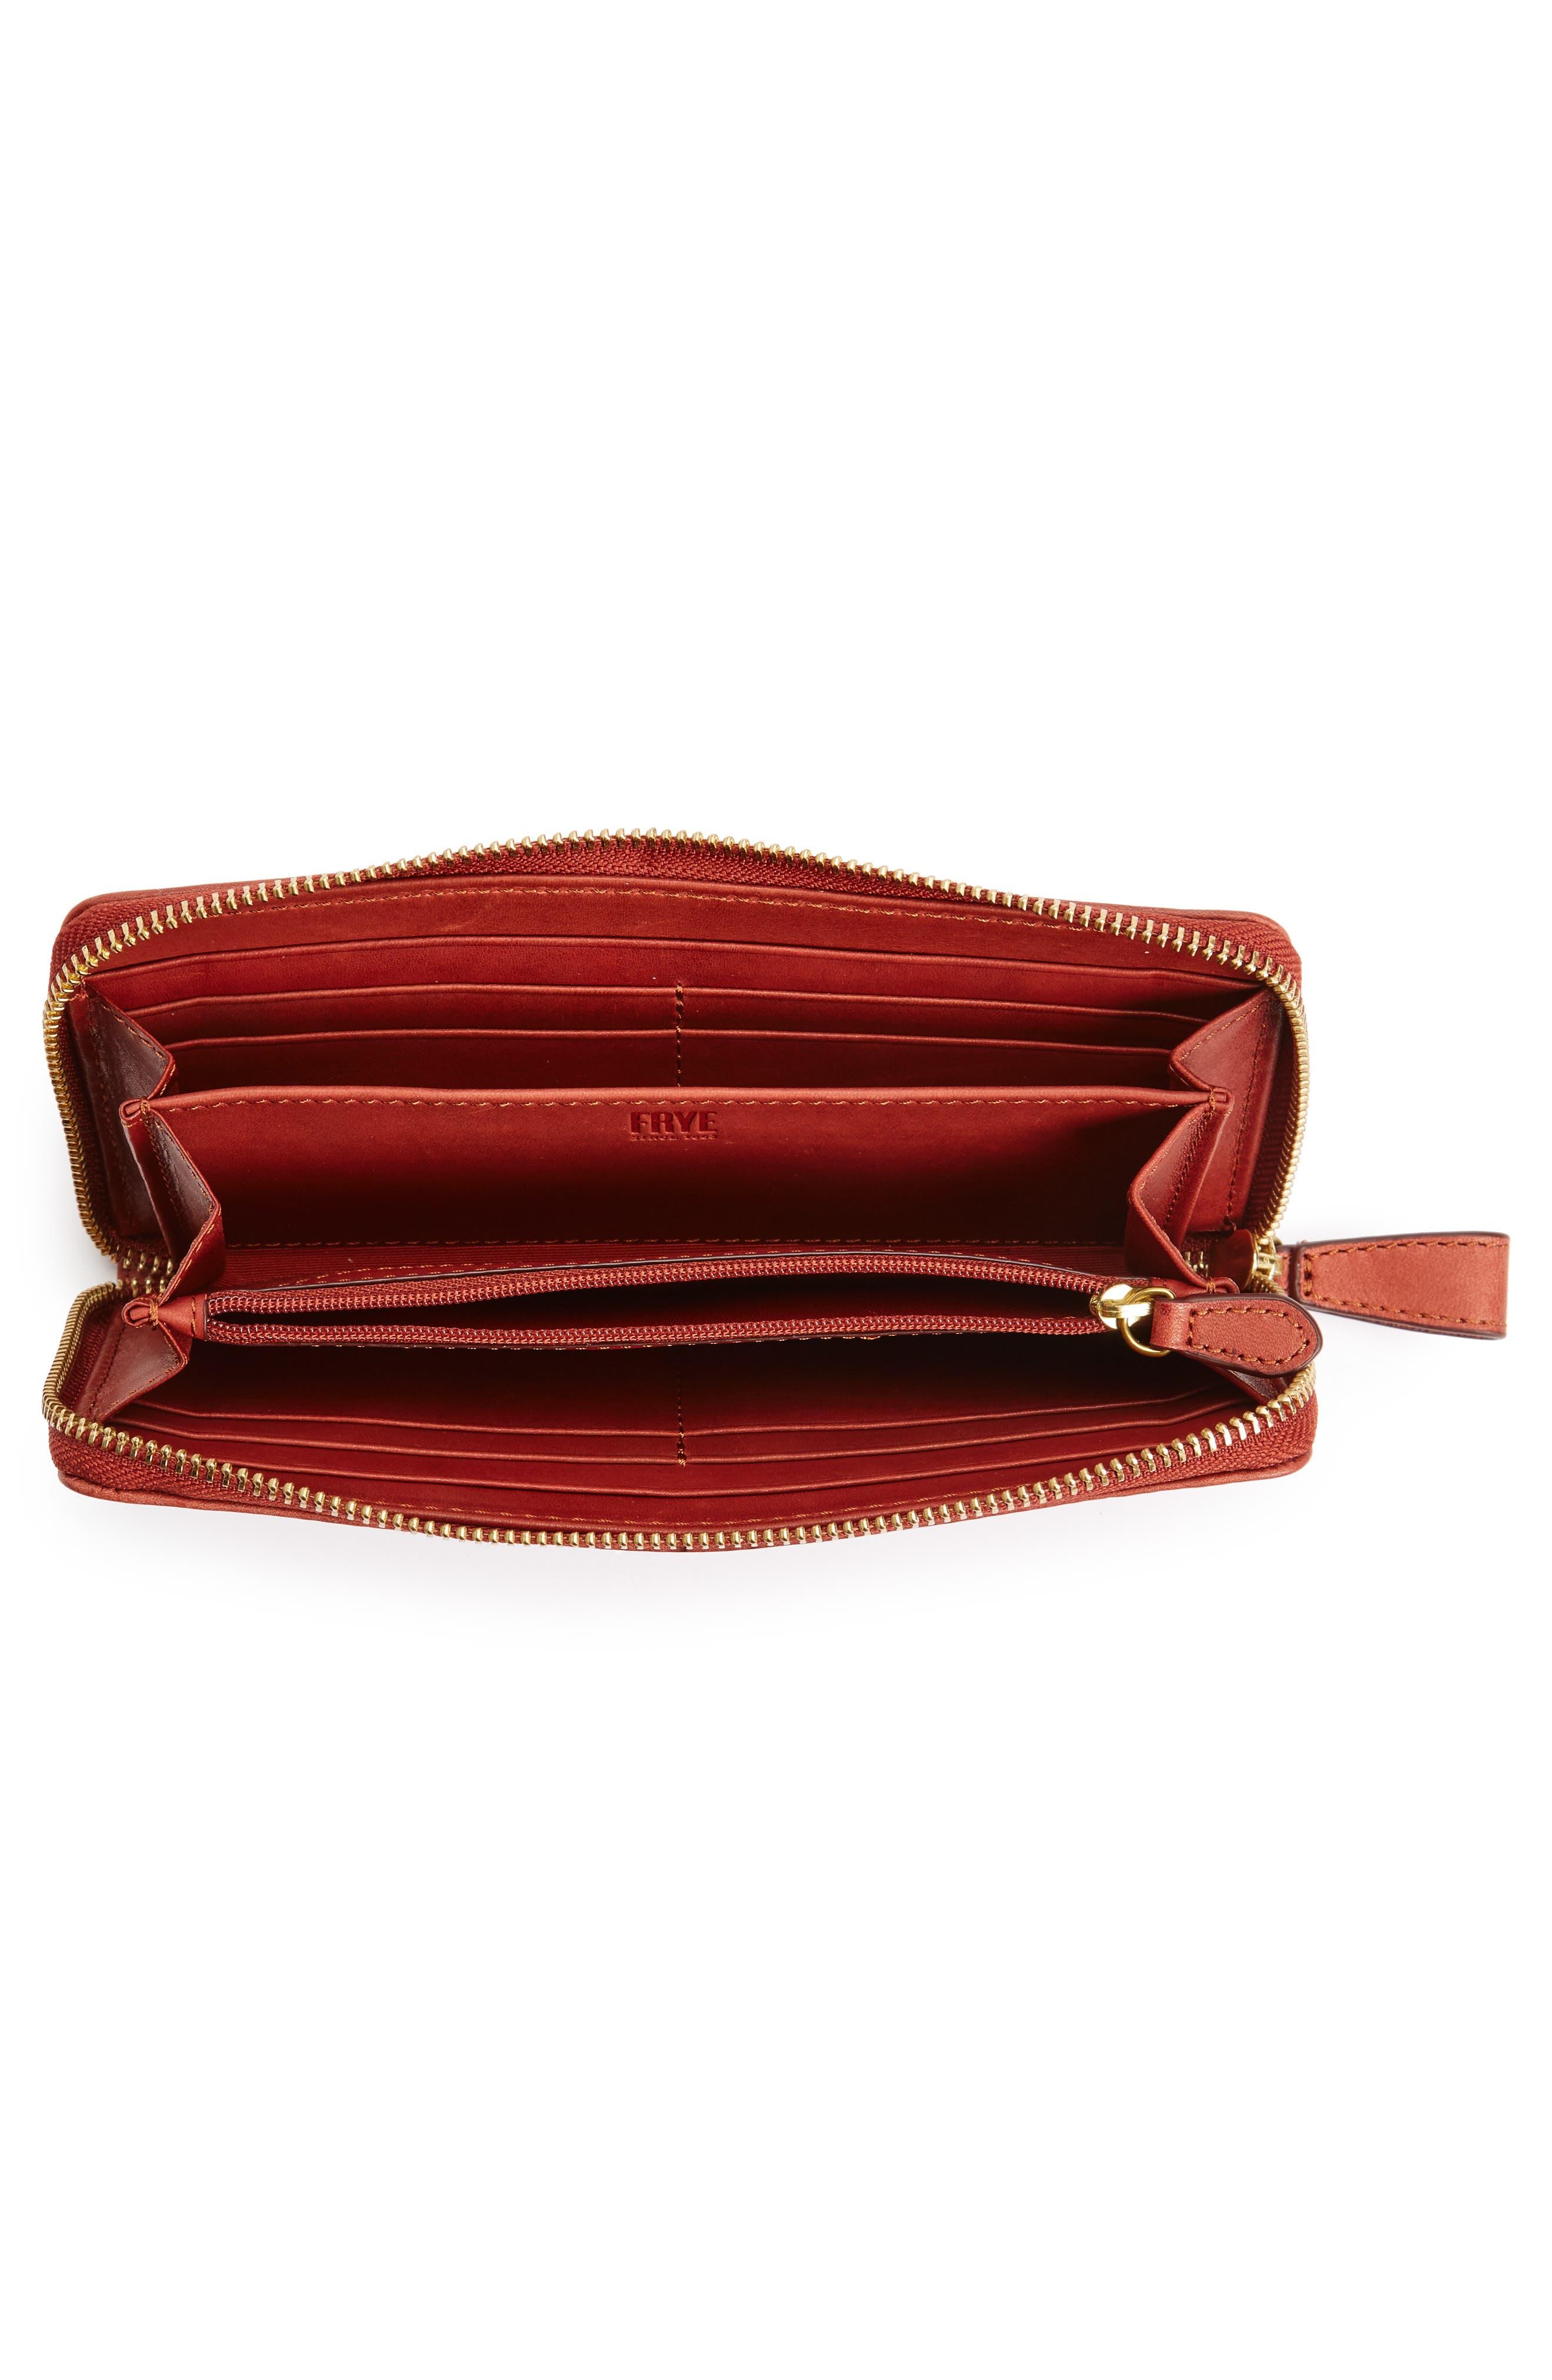 Campus Rivet Leather Continental Zip Wallet,                             Alternate thumbnail 12, color,